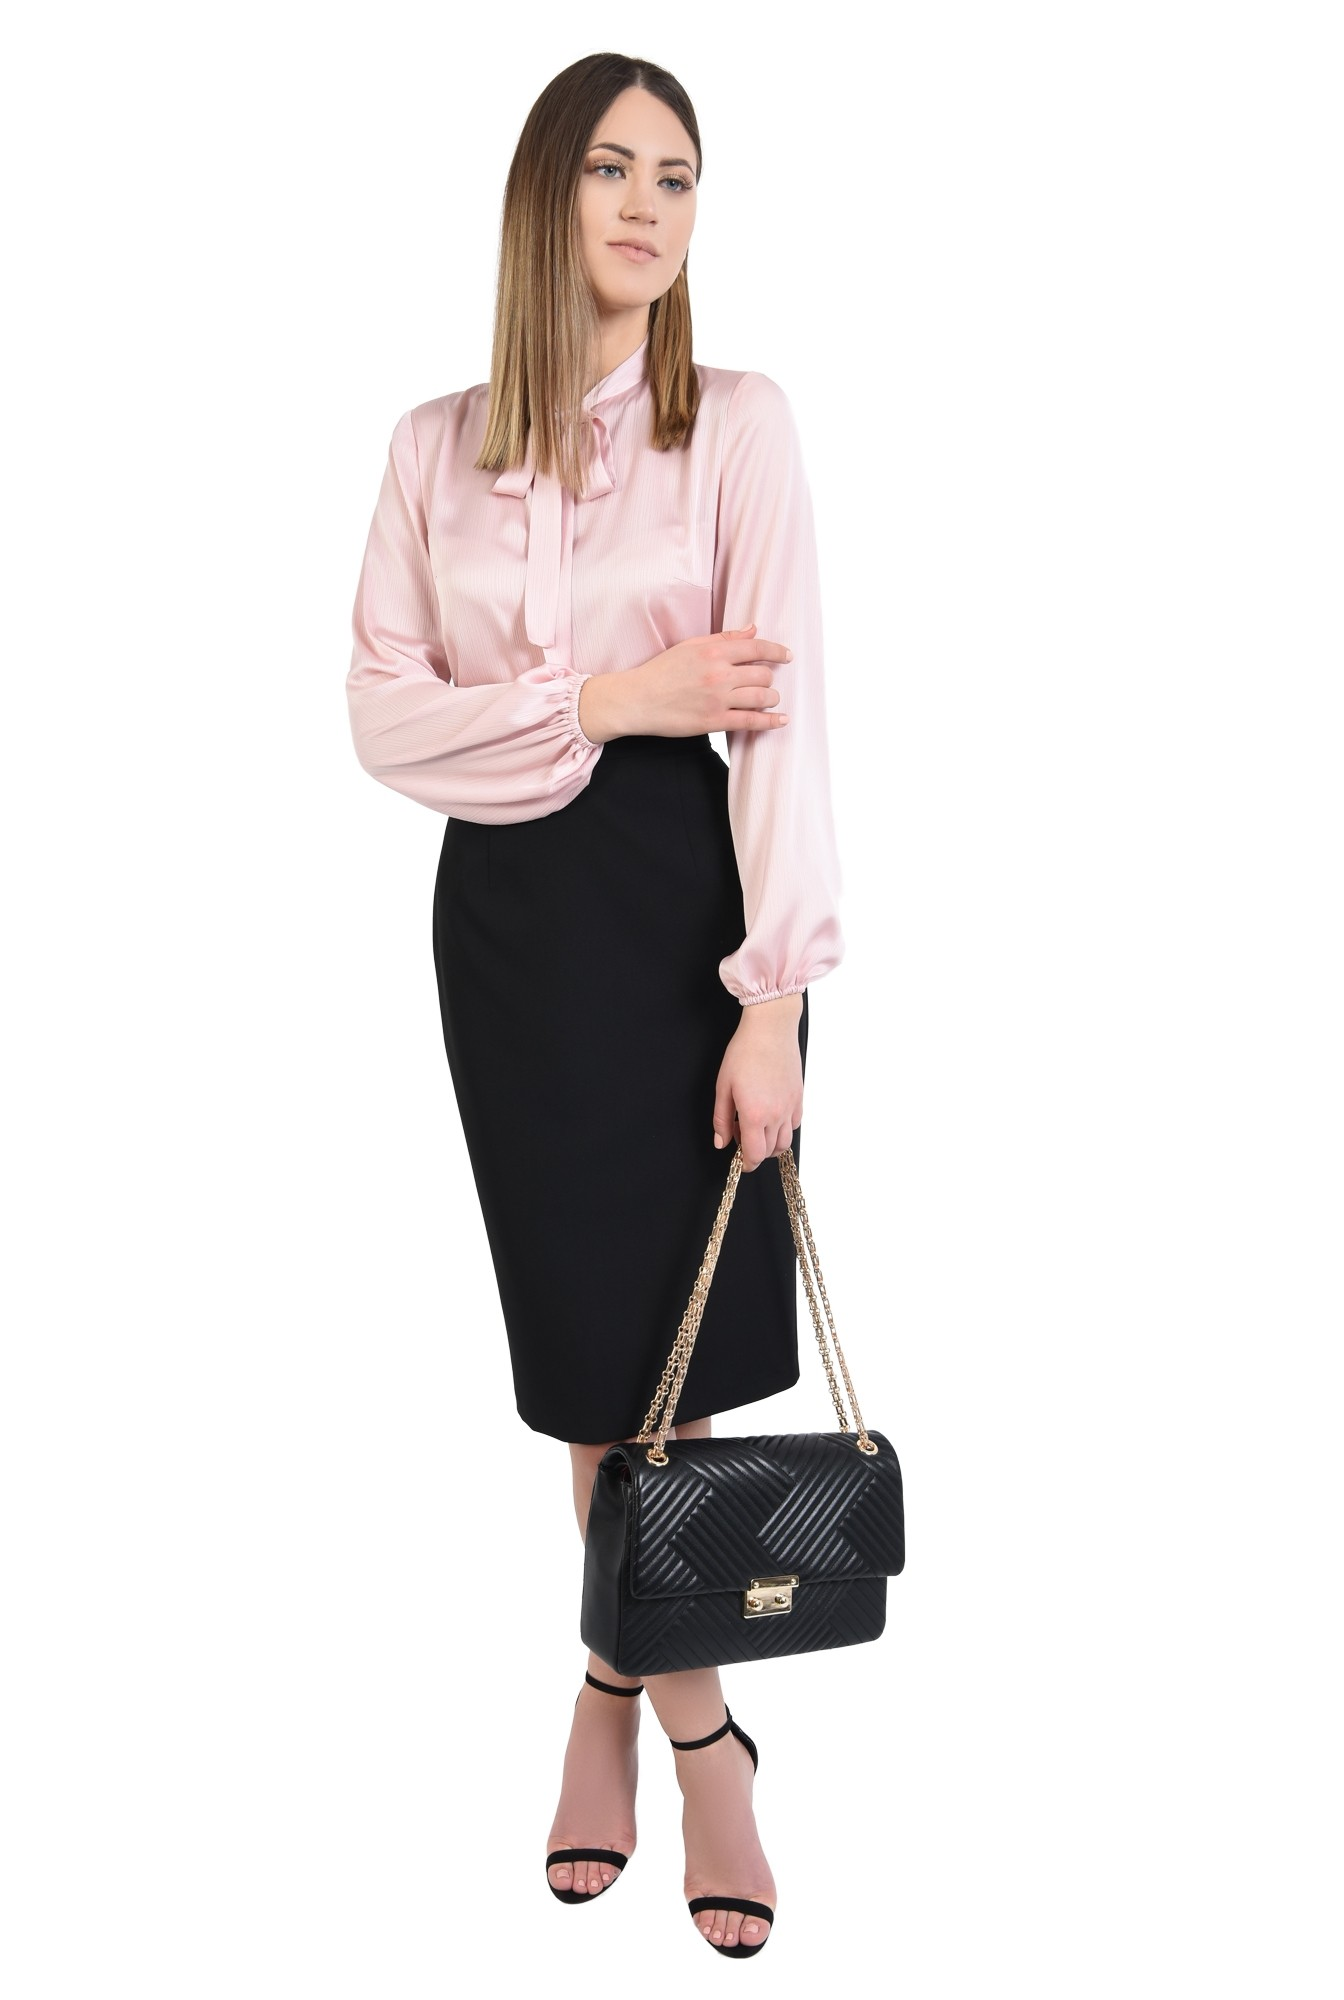 3 - 360 - bluza roz, dreapta, cu guler esarfa subtire, maneci bufante